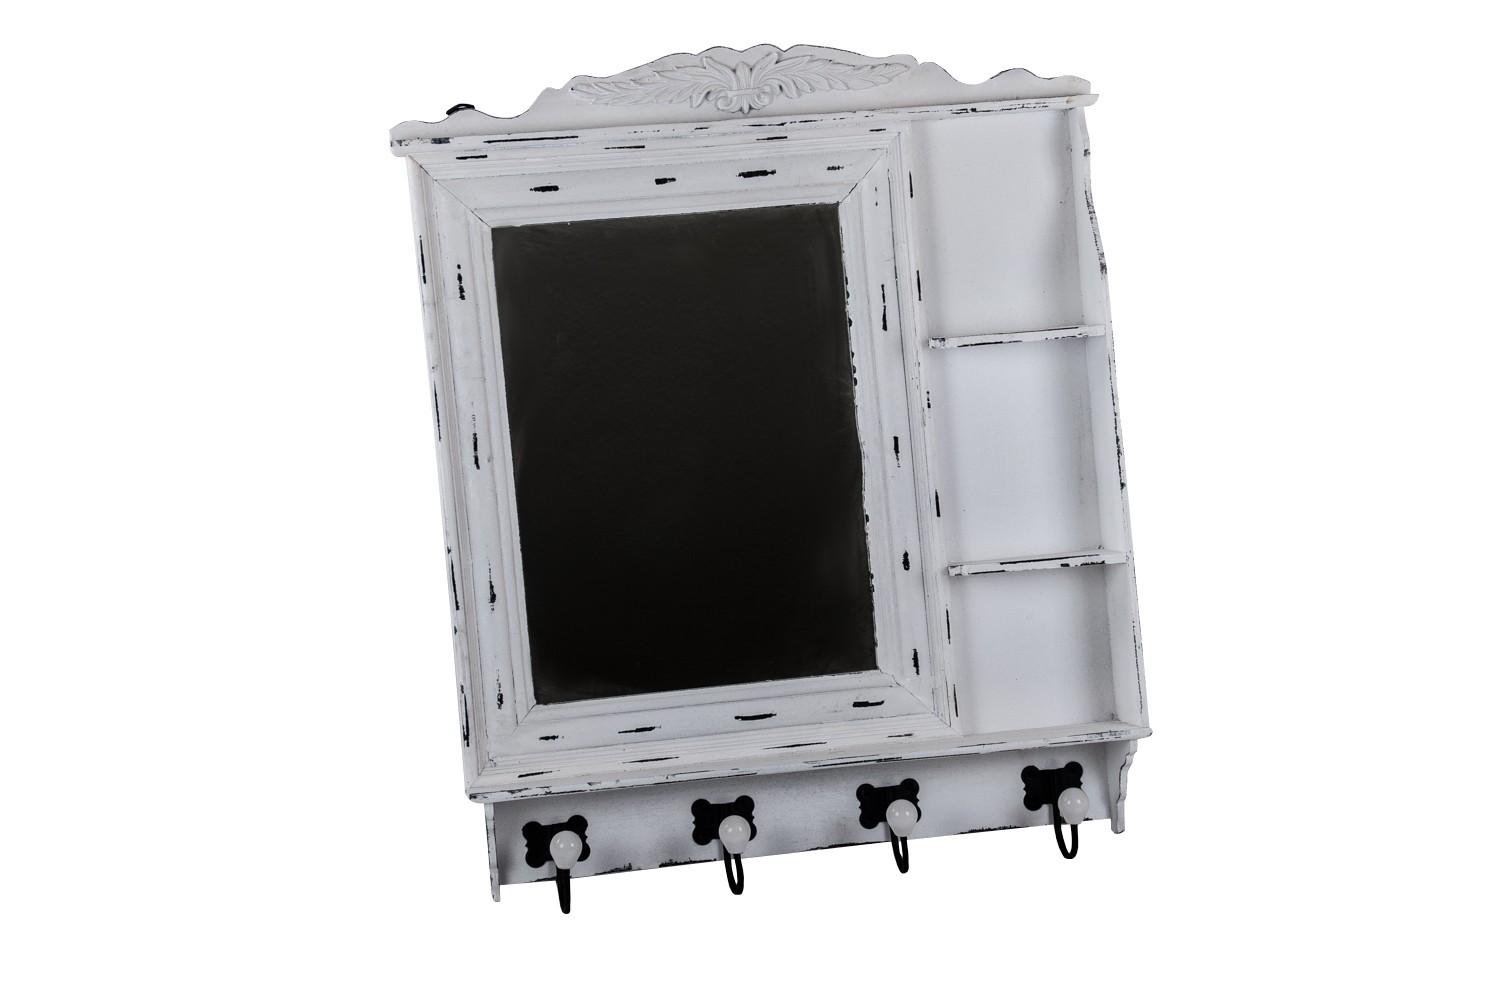 vintage garderobe spiegel hakenleiste flurgarderobe kleiderhaken wandgarderobe ebay. Black Bedroom Furniture Sets. Home Design Ideas